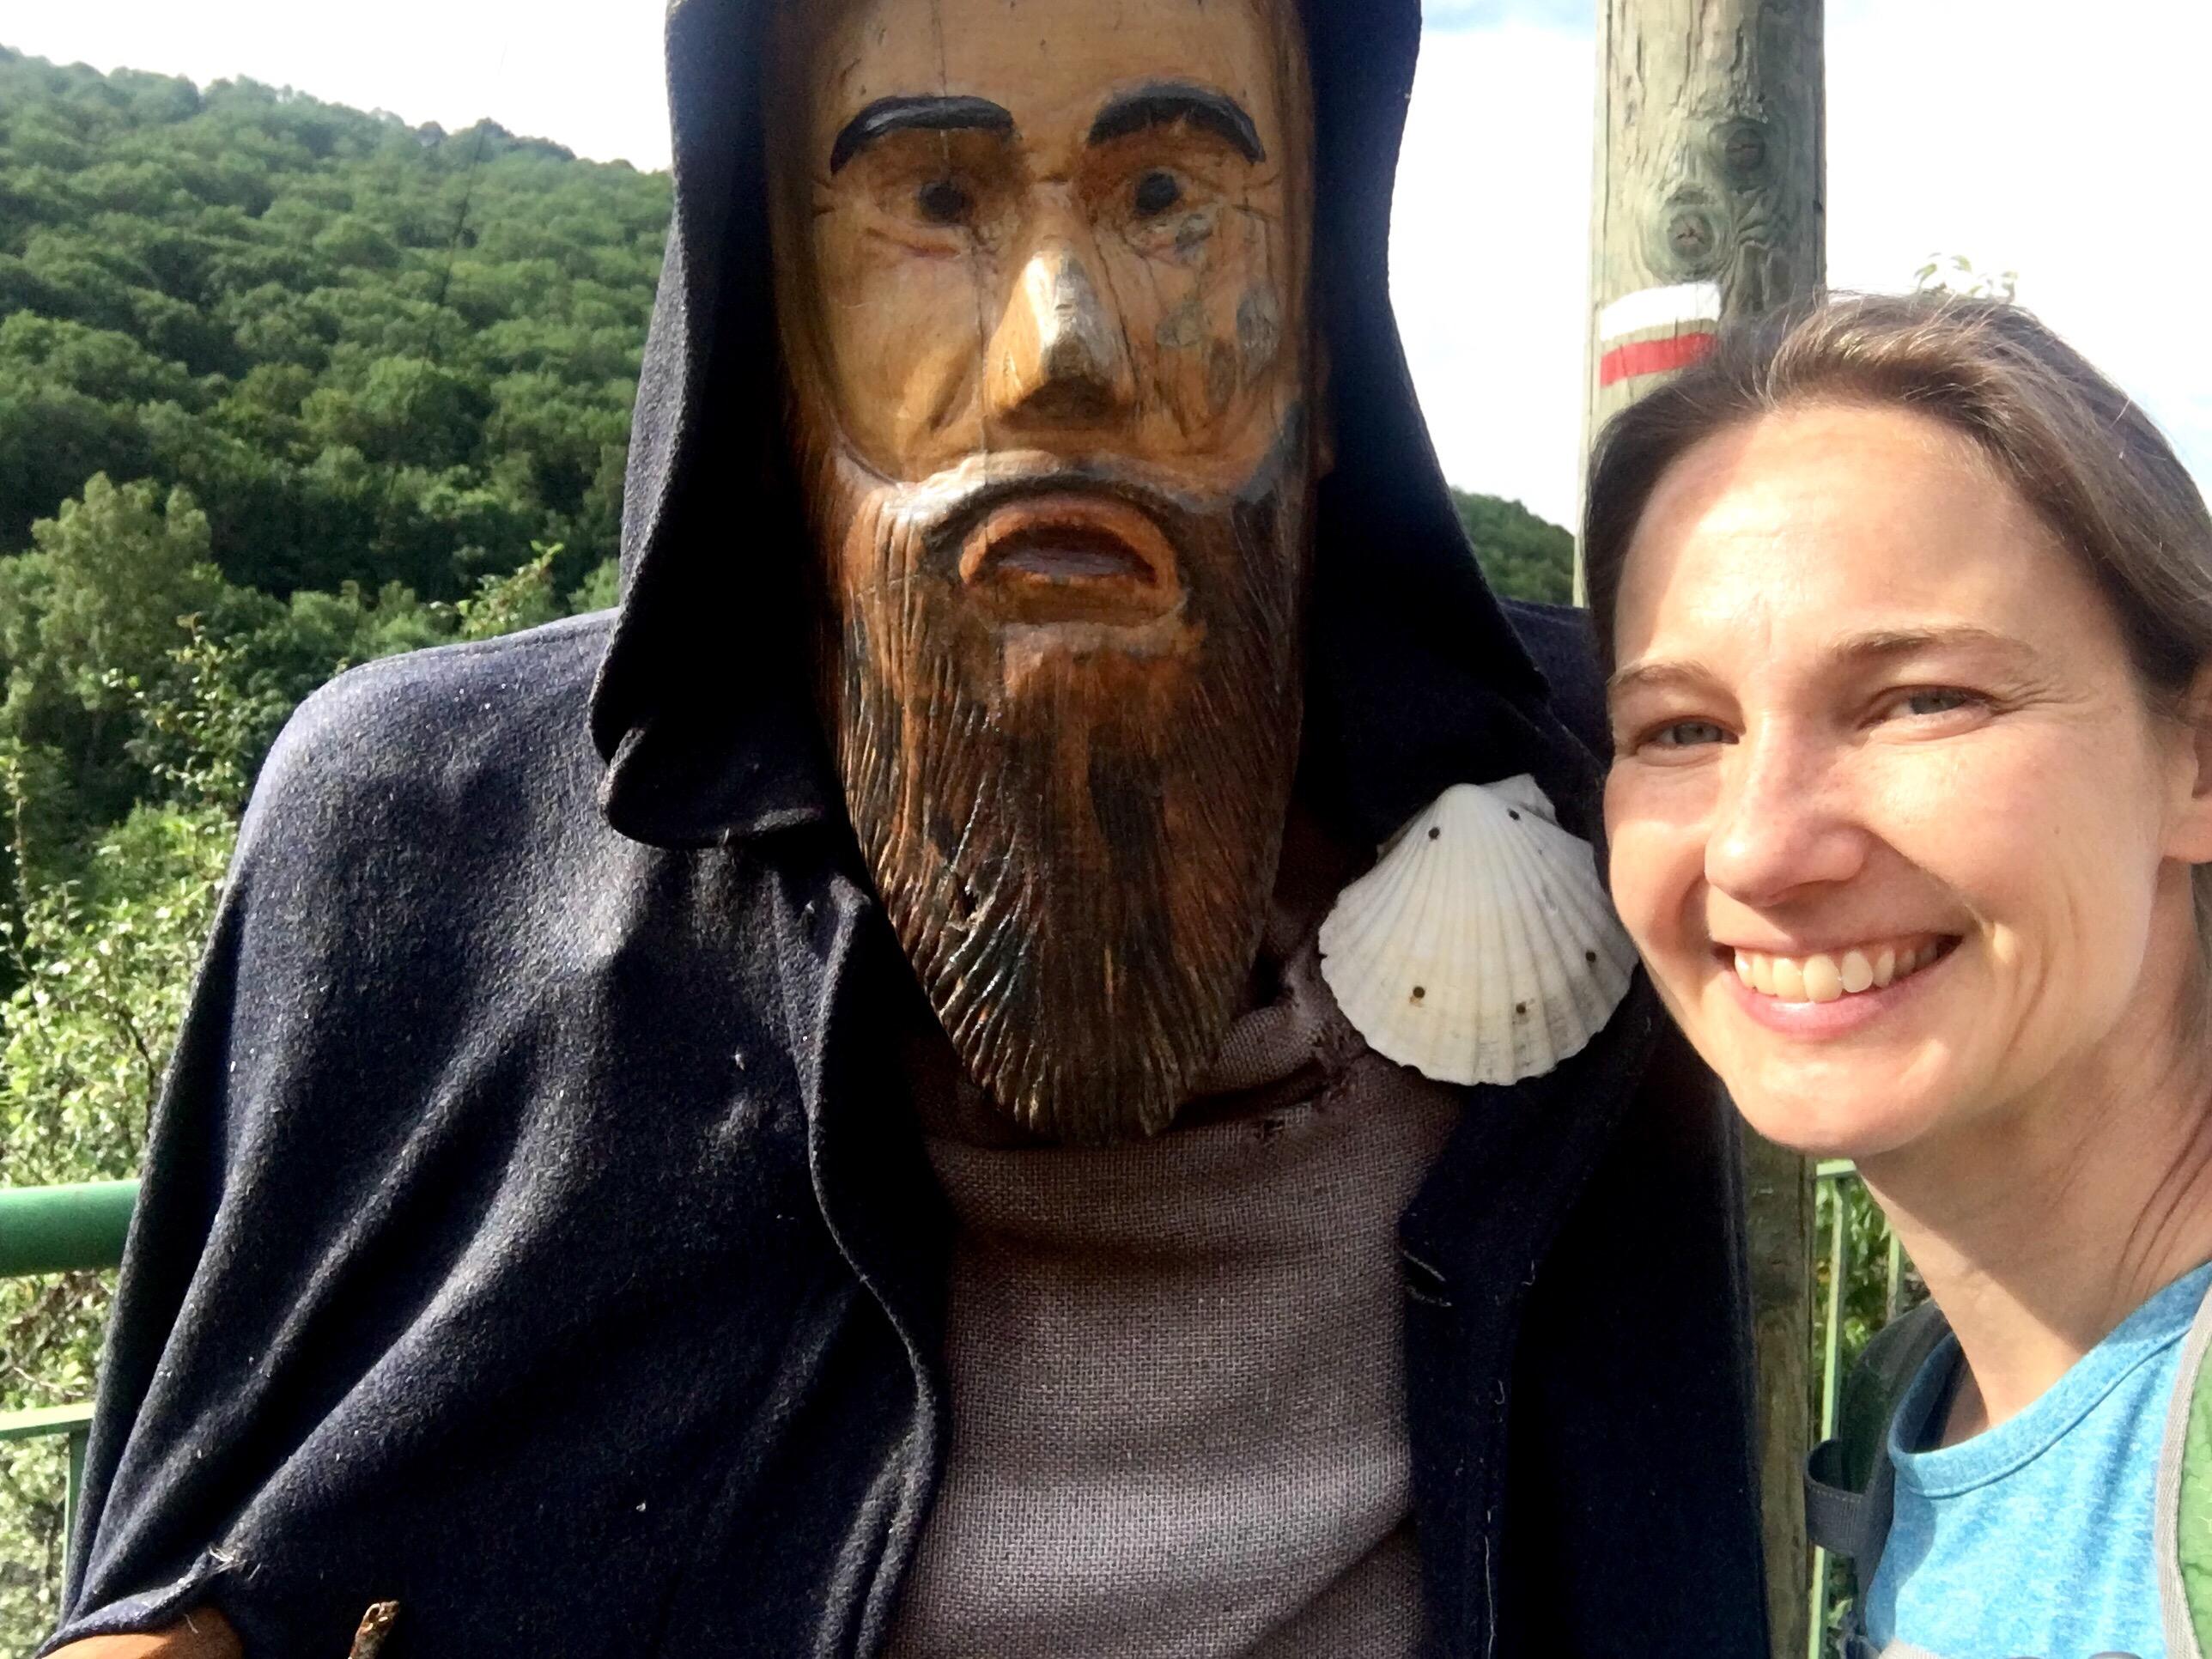 Selfie with pilgrim statue; Chemin du Puy